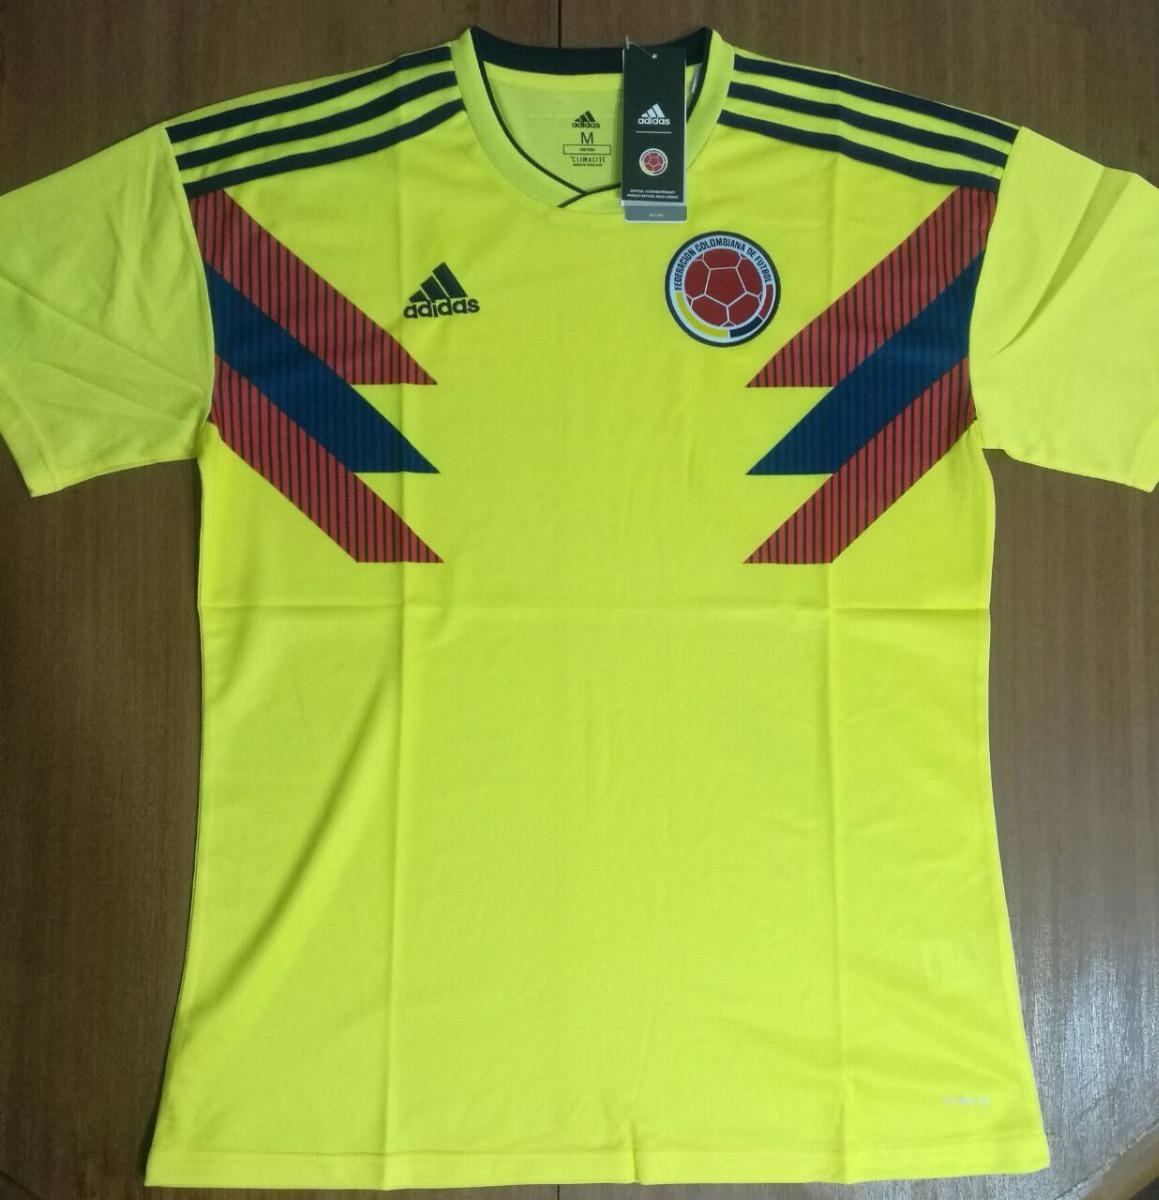 camiseta colombia mundial 2018 100% original envíos adidas. Cargando zoom. ef75669e8e4c5